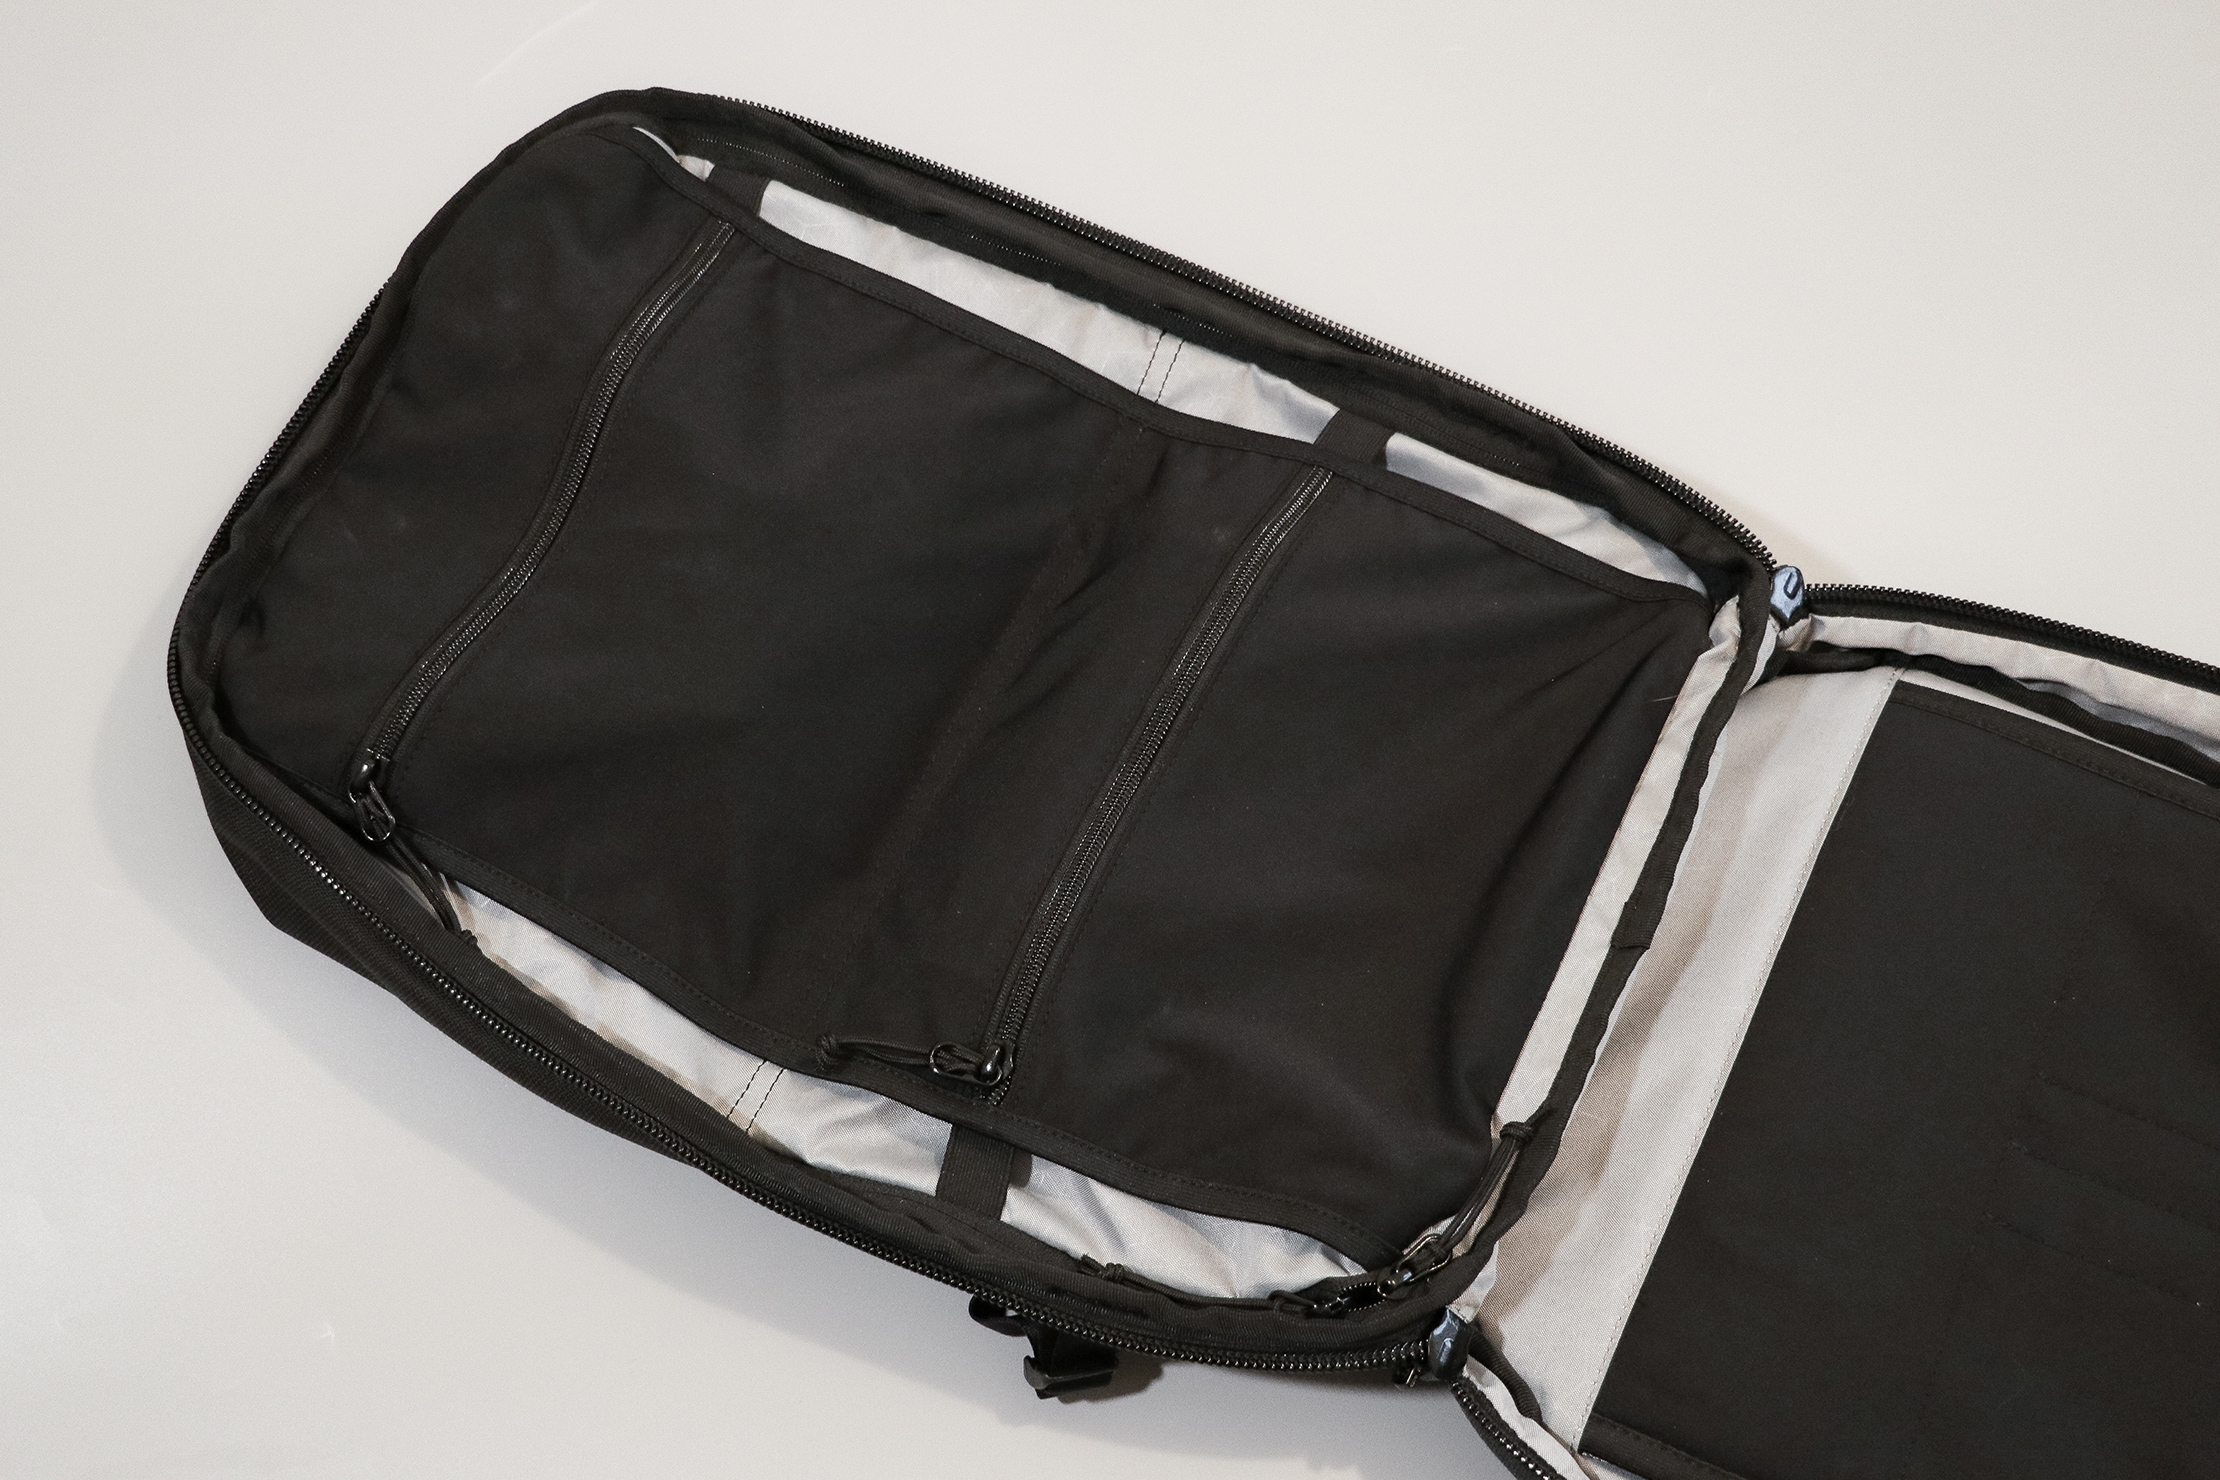 Heimplanet Travel Pack 28L (V2) Main Compartment Divider Organization